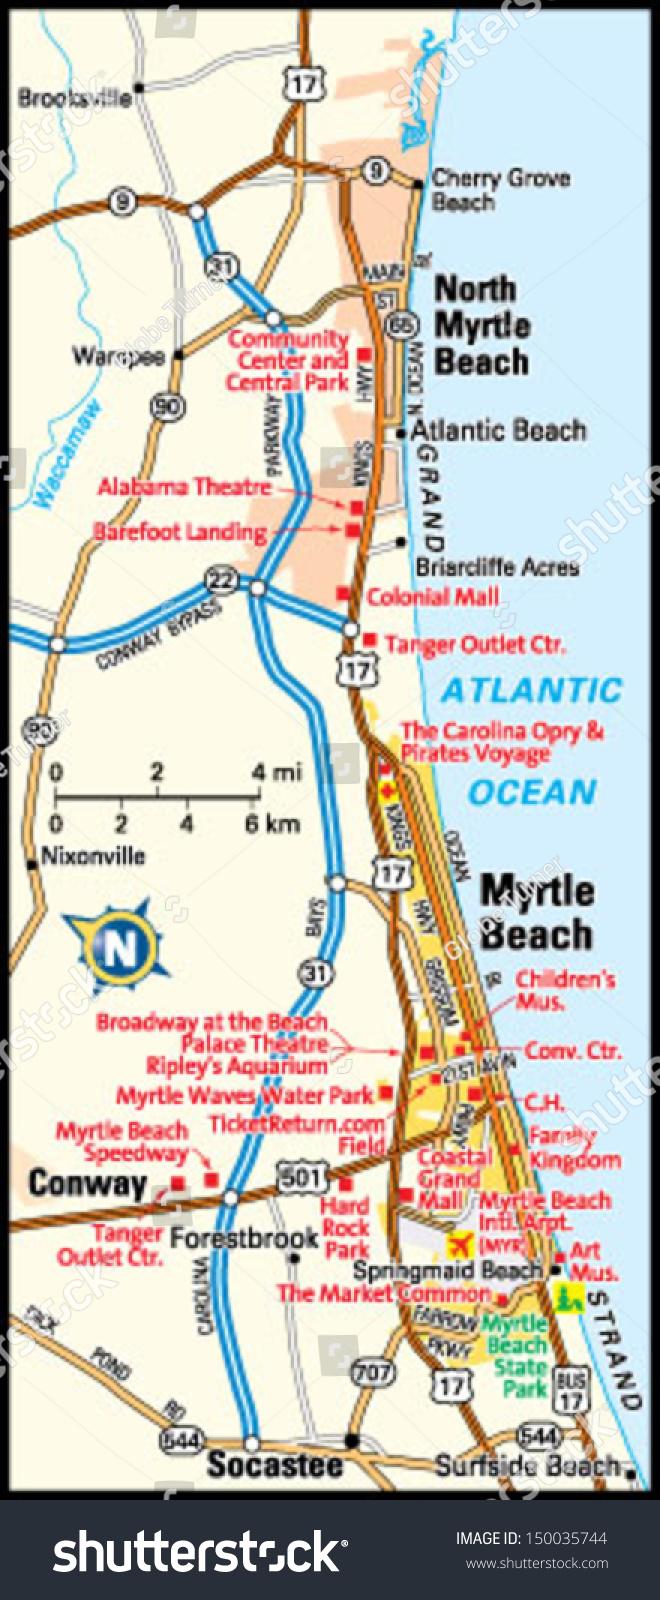 Httpsimageshutterstockcomzstockvectormyrt - Myrtle beach map